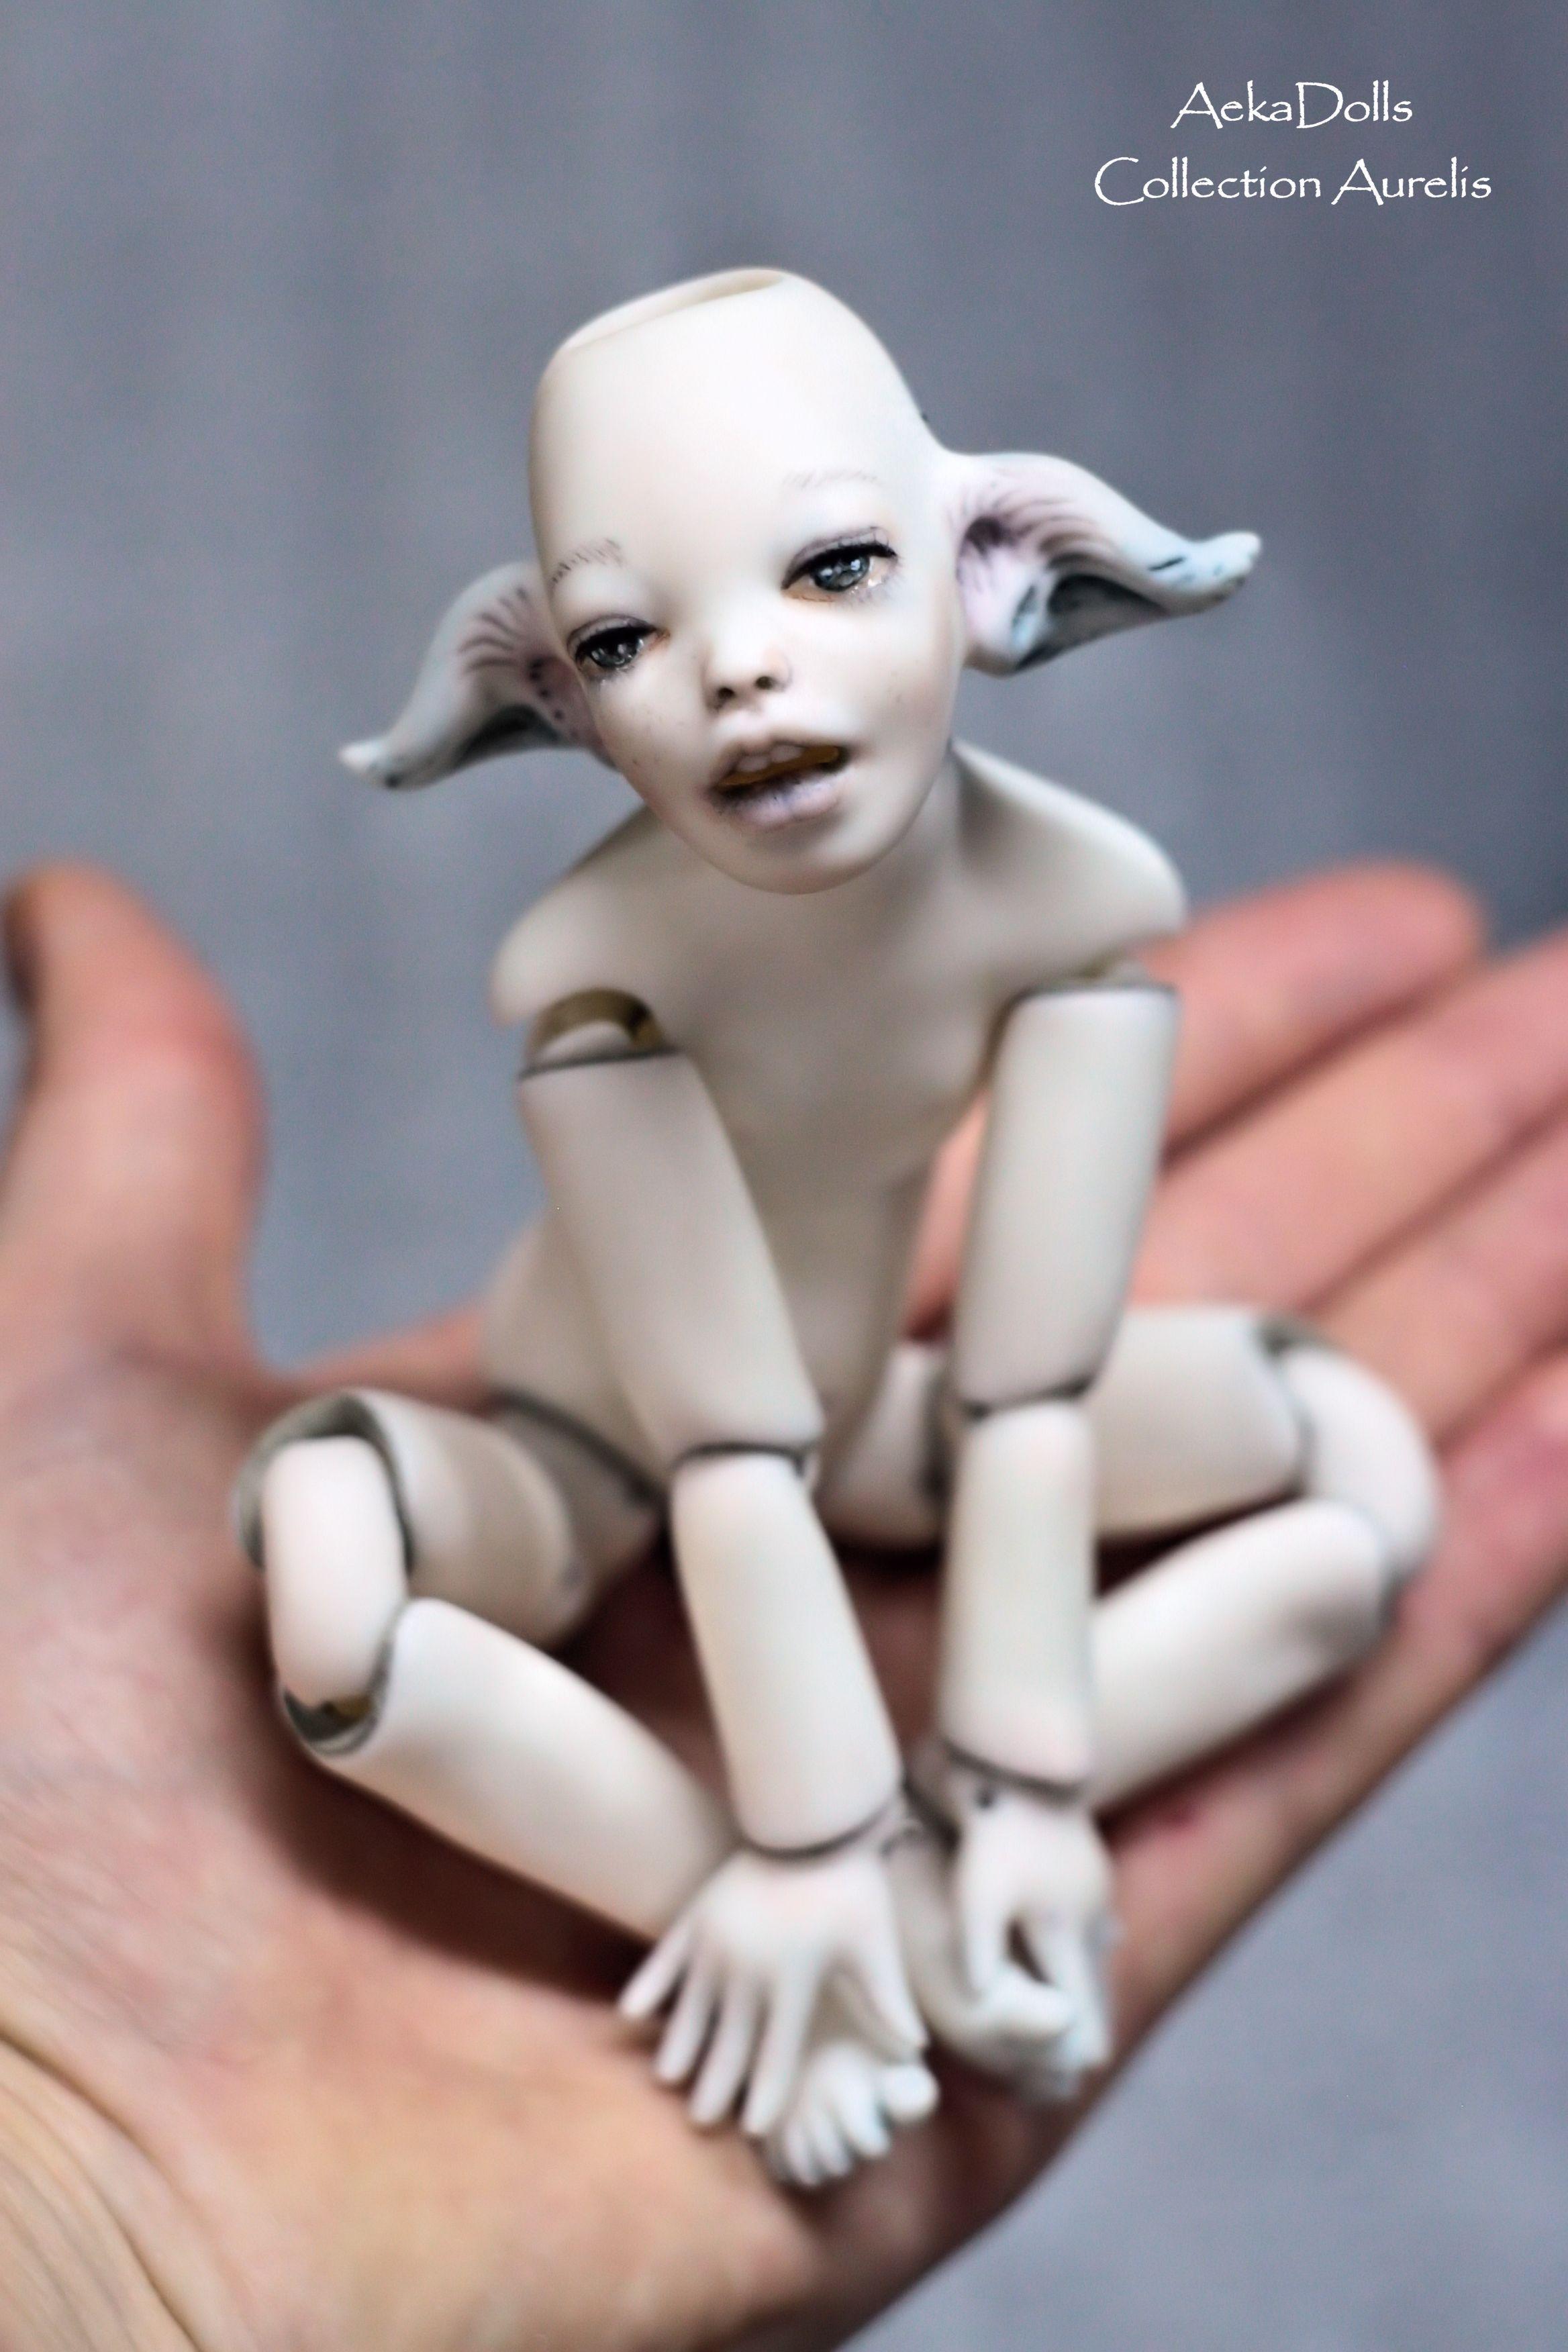 AekaDolls/ porcelain ball-jointed doll by Elena Alekhina/ Collection Aurelis http://www.livemaster.ru/aekadoll